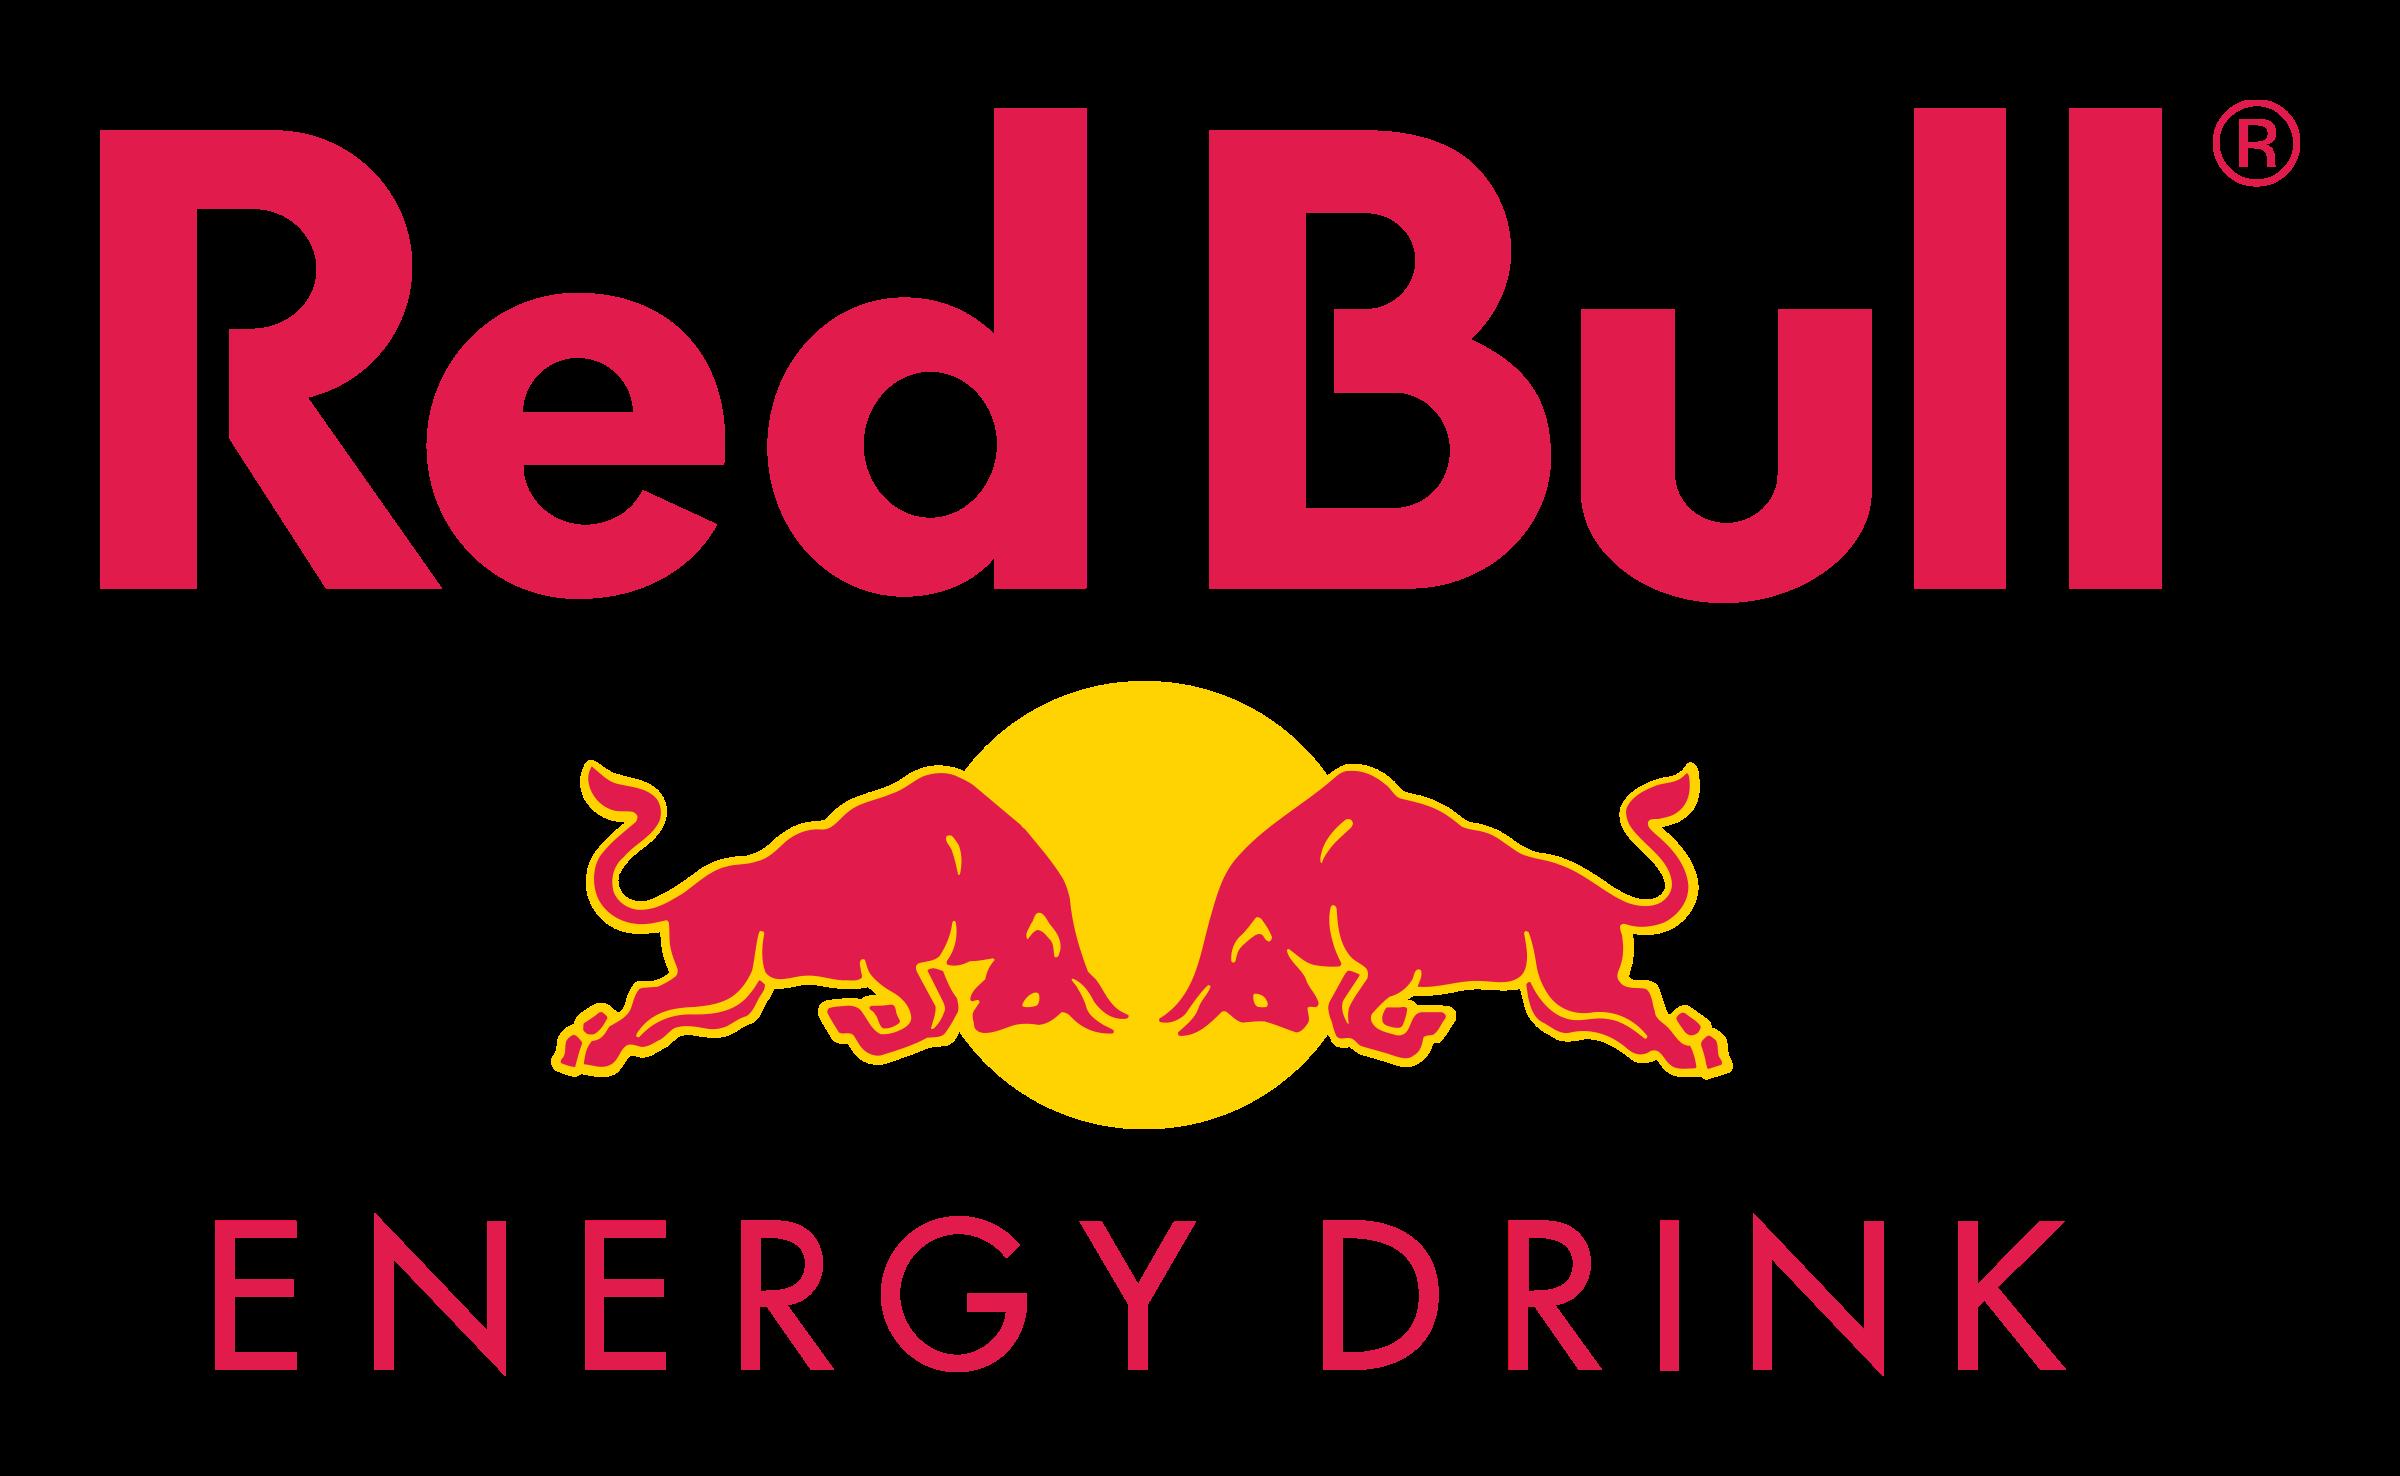 red-bull-logo-png-transparent